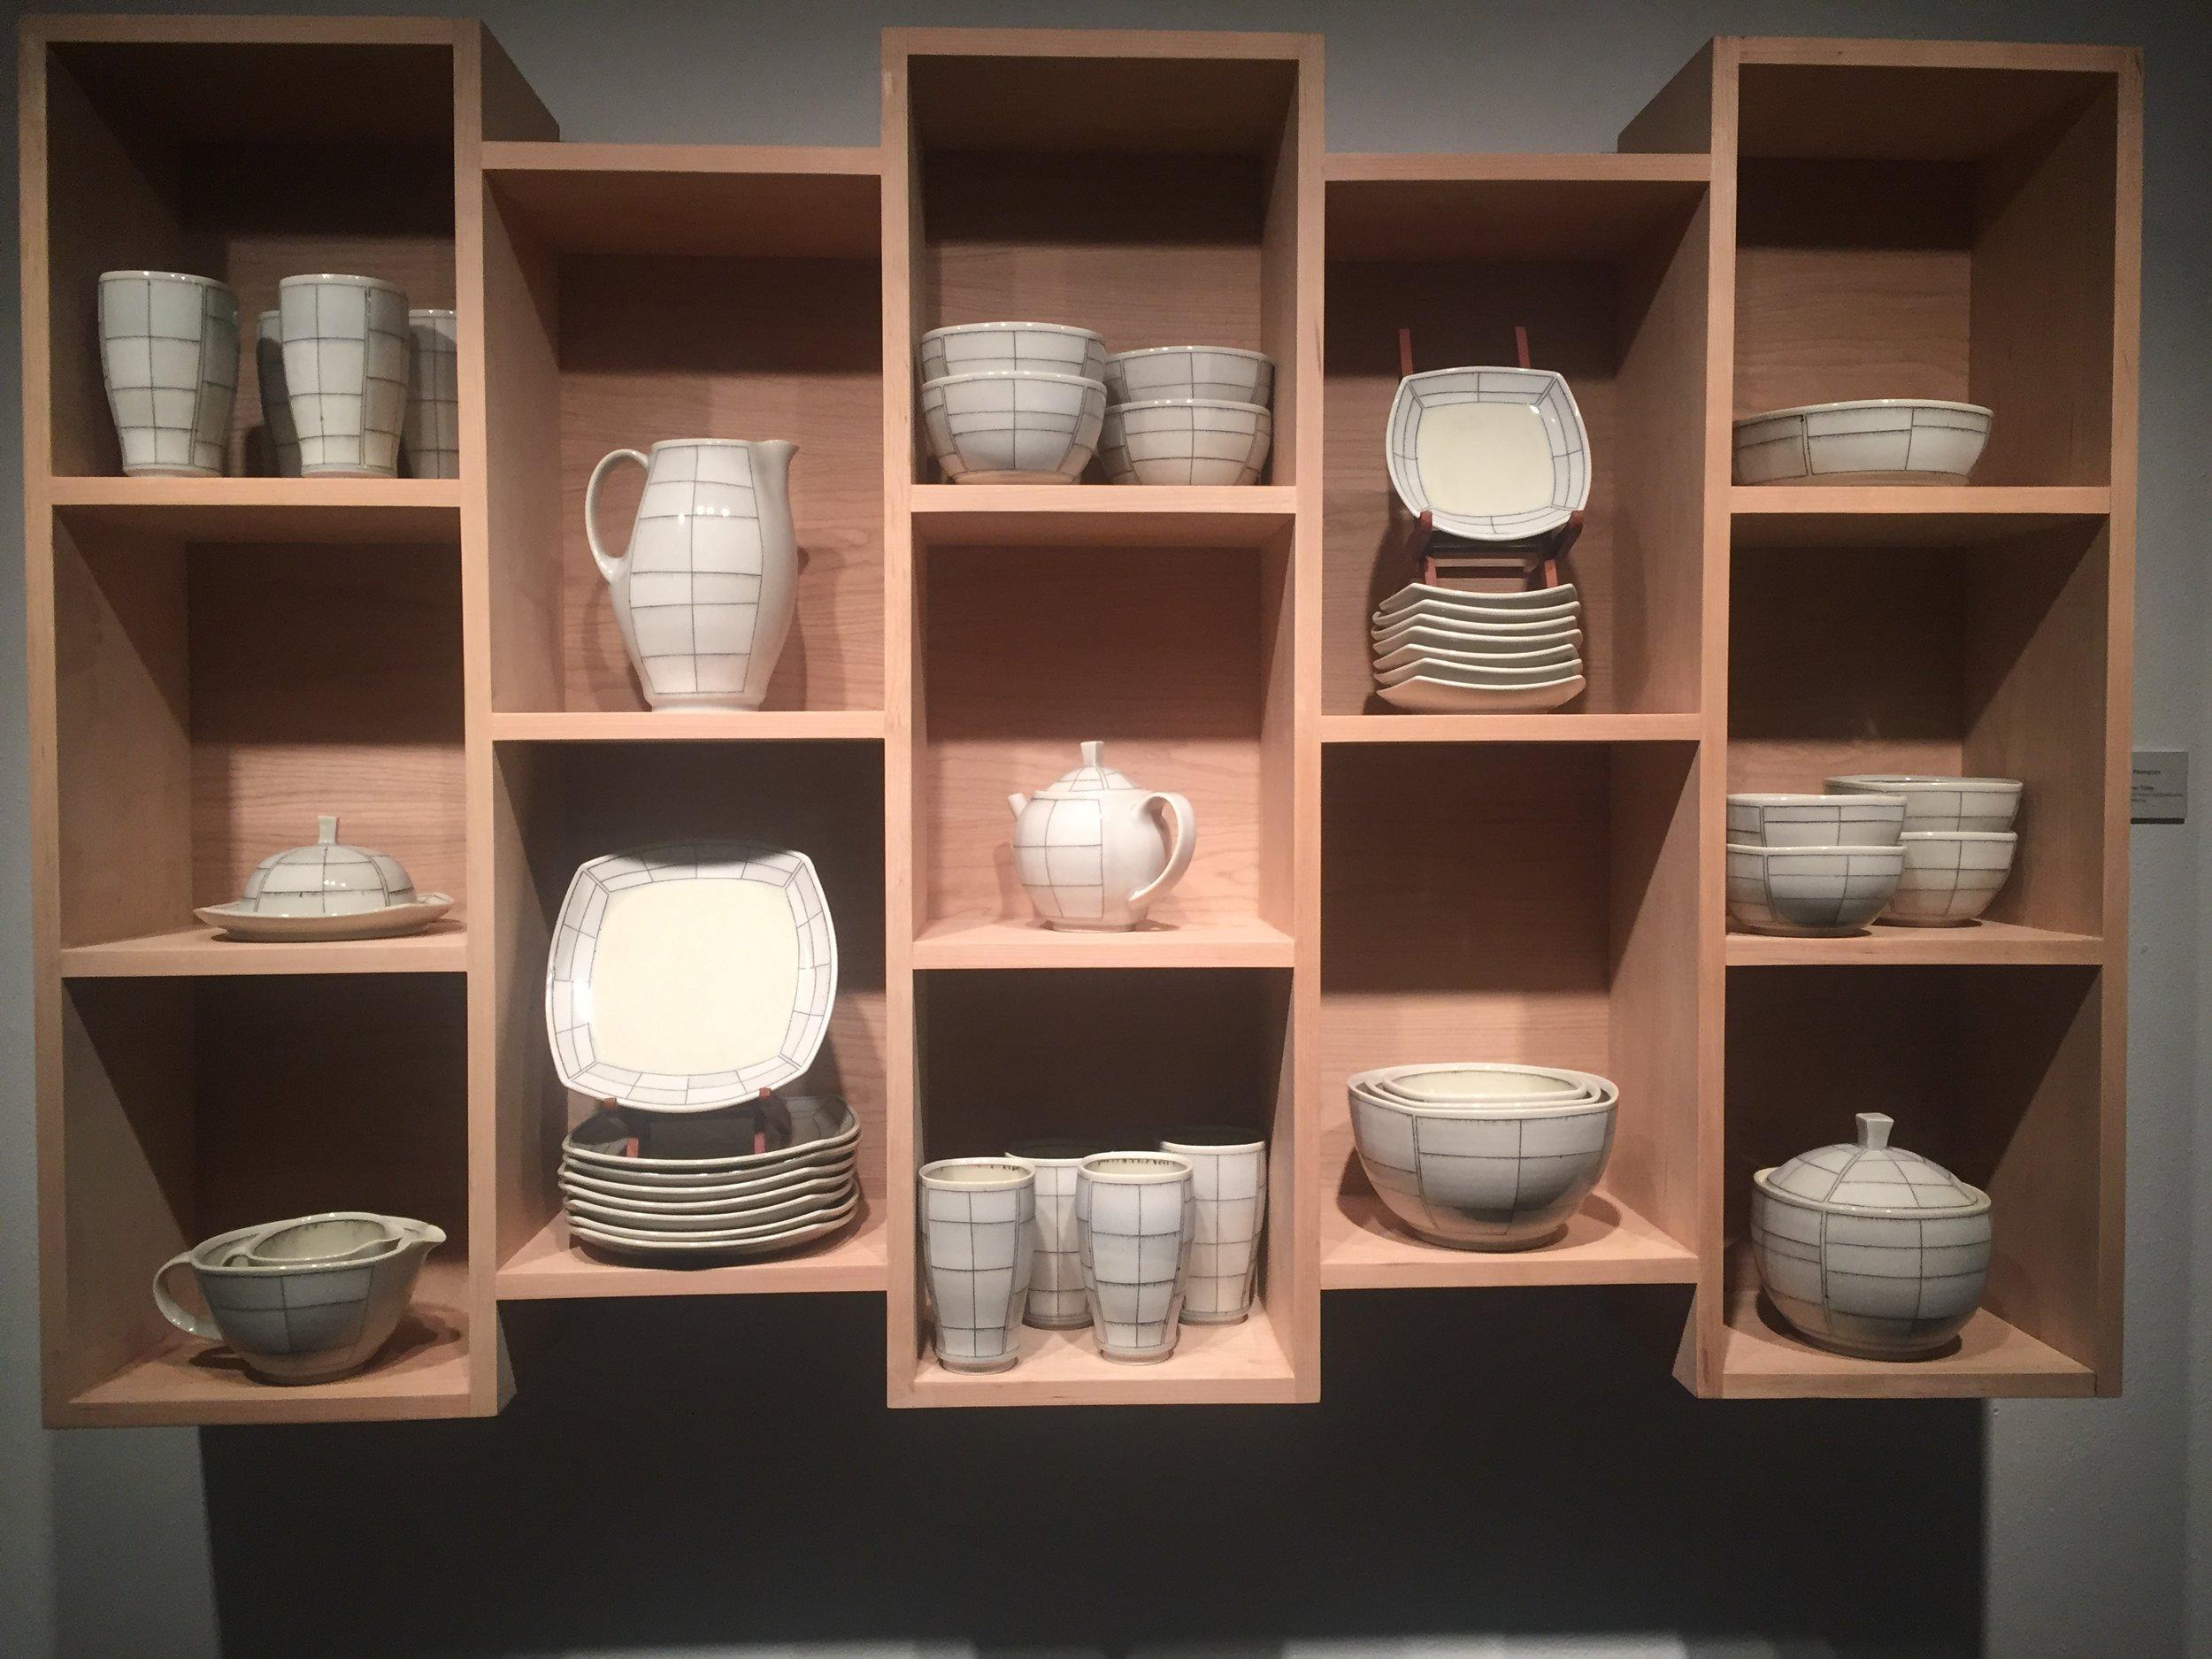 Handmade High-Fired Porcelain Dishware